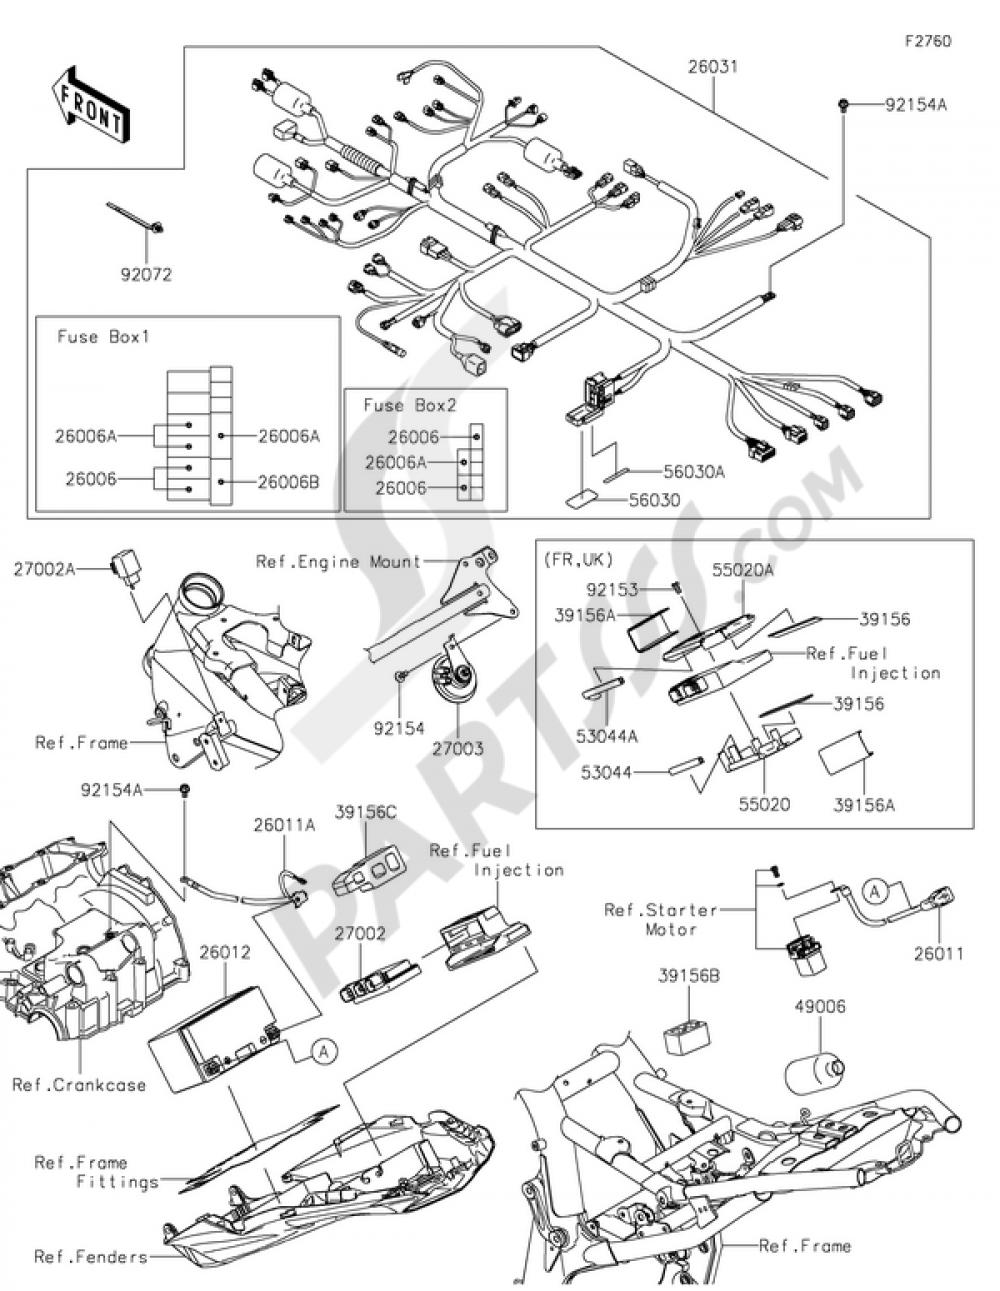 chassis electrical equipment kawasaki z800 2016